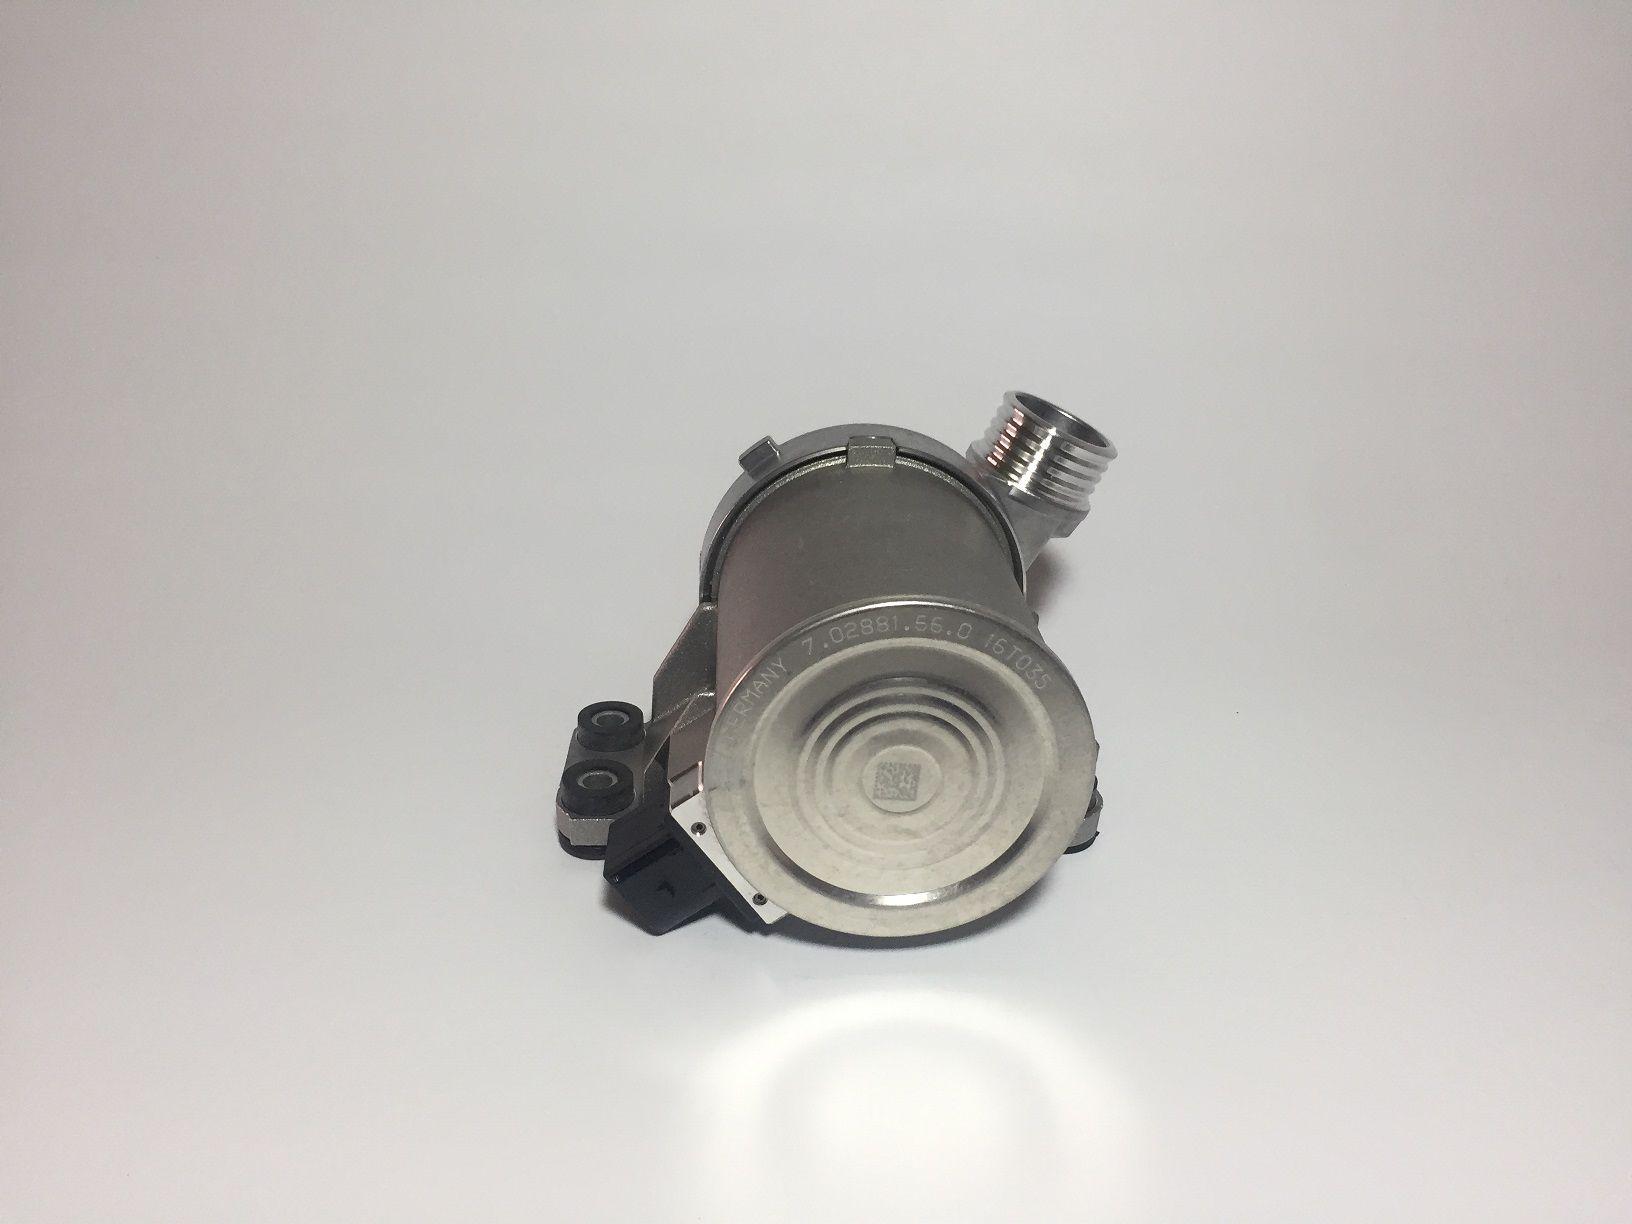 Bomba de água elétrica BMW 335 135 235 M235 2012 a 2018 X5 X6 35i 2012 2018